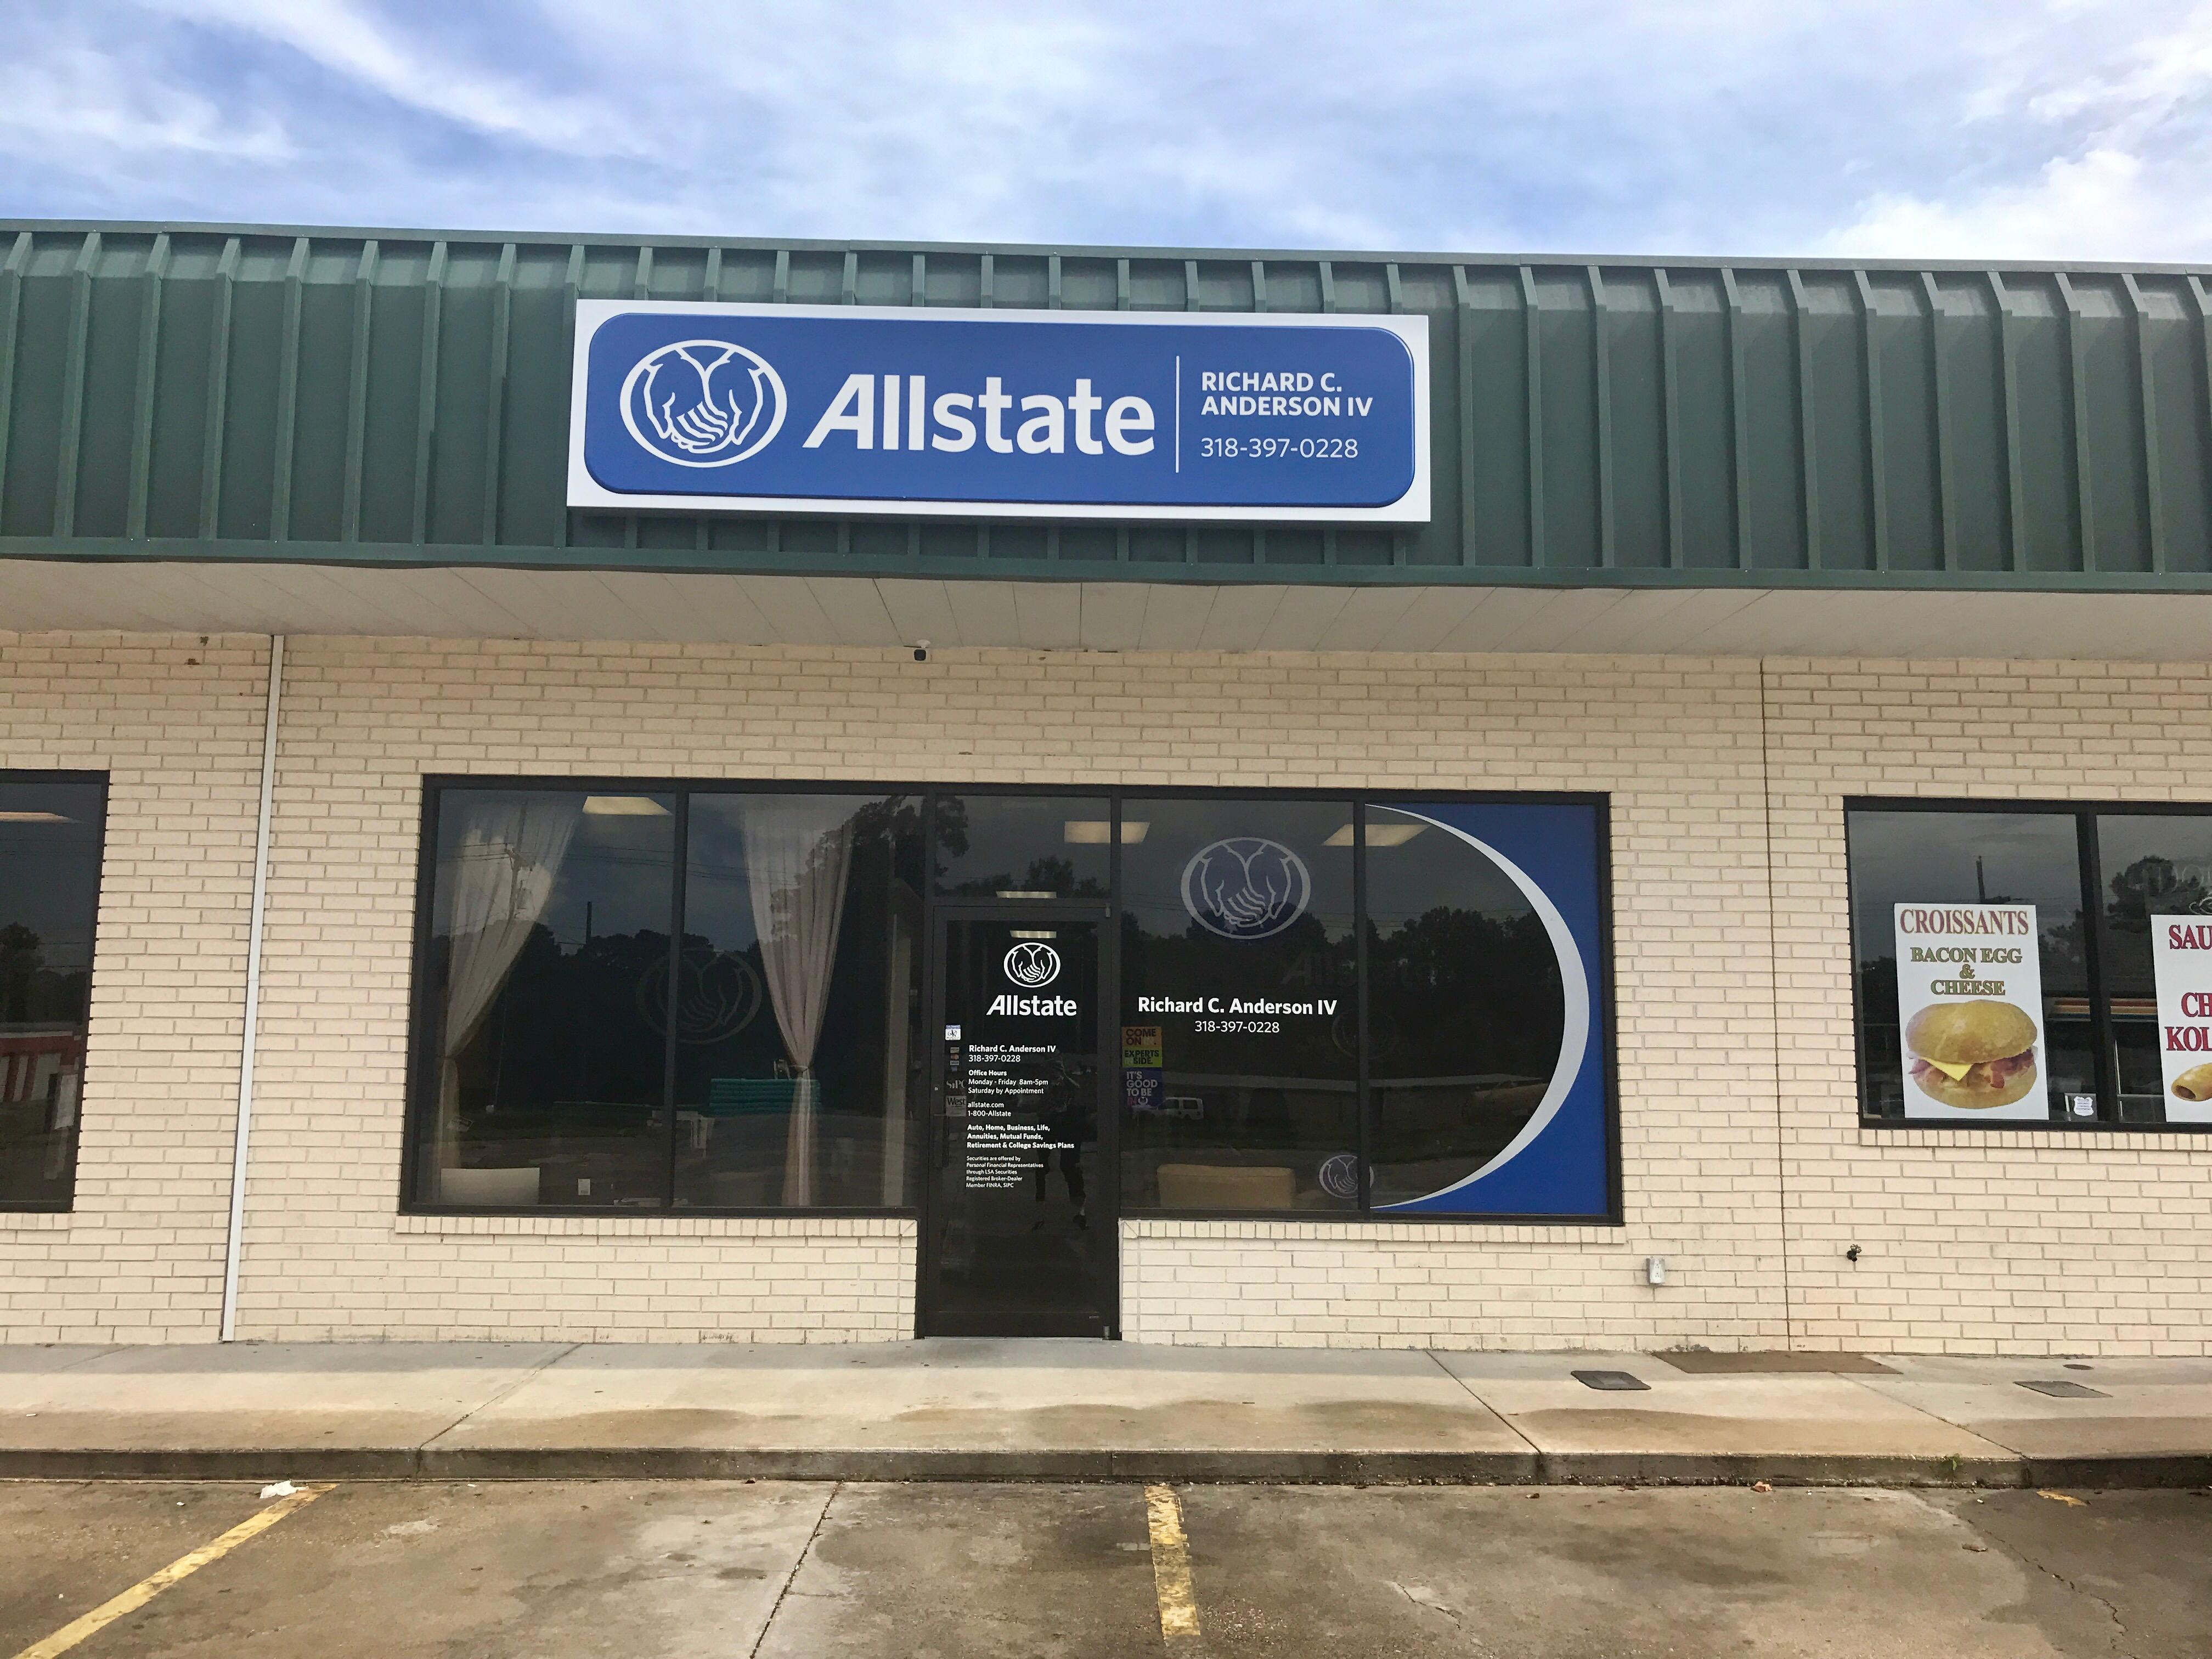 Richard C Anderson IV: Allstate Insurance image 1